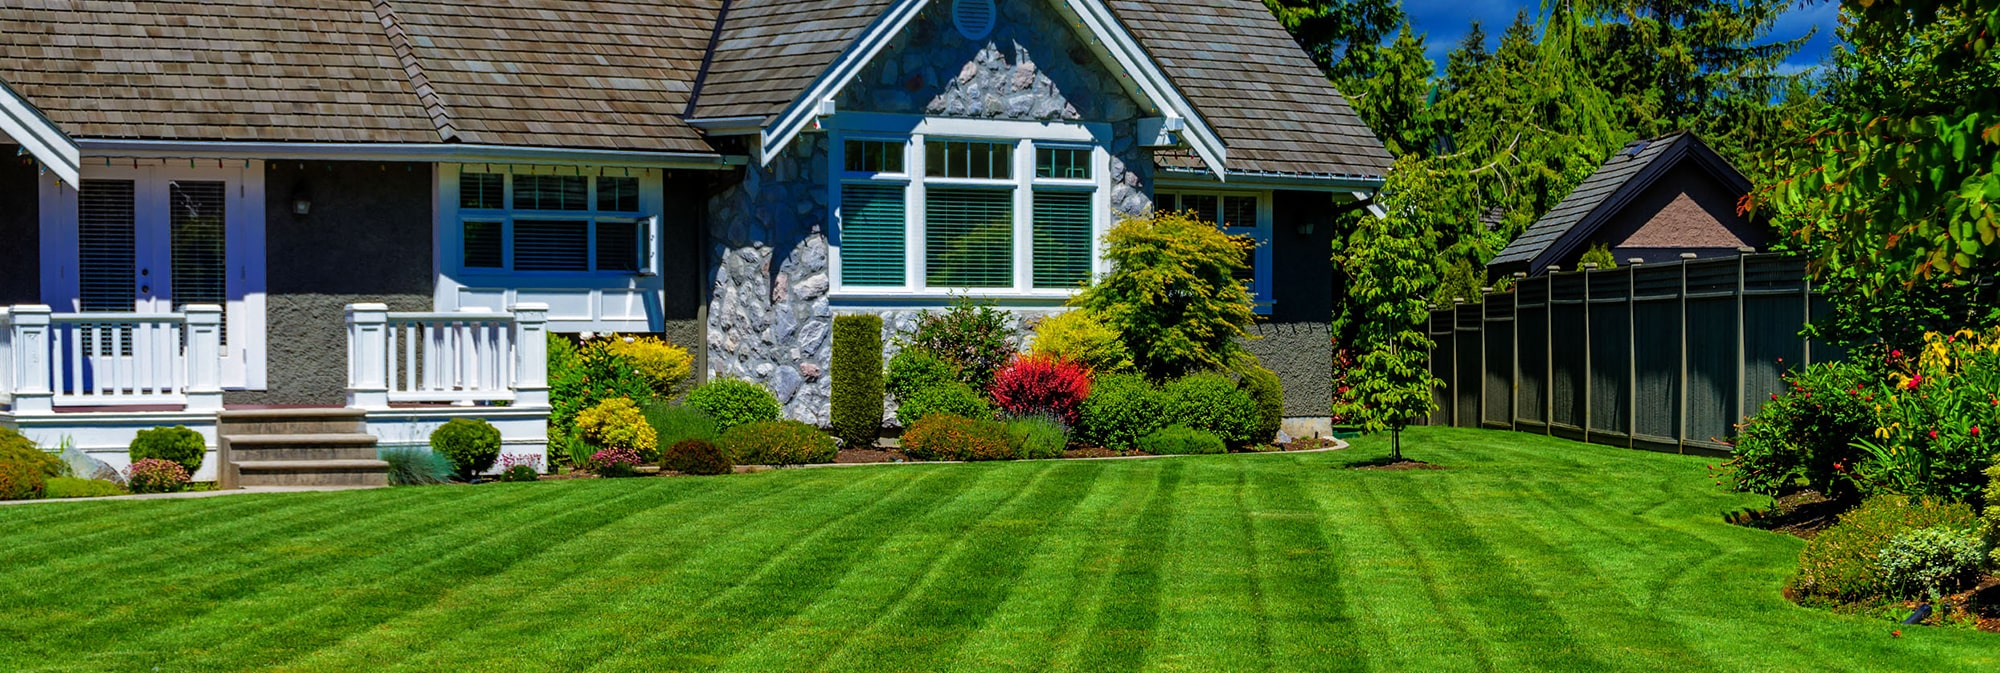 Yard Maintenance Solutions In Pennsylvania Showcase Lawn Works